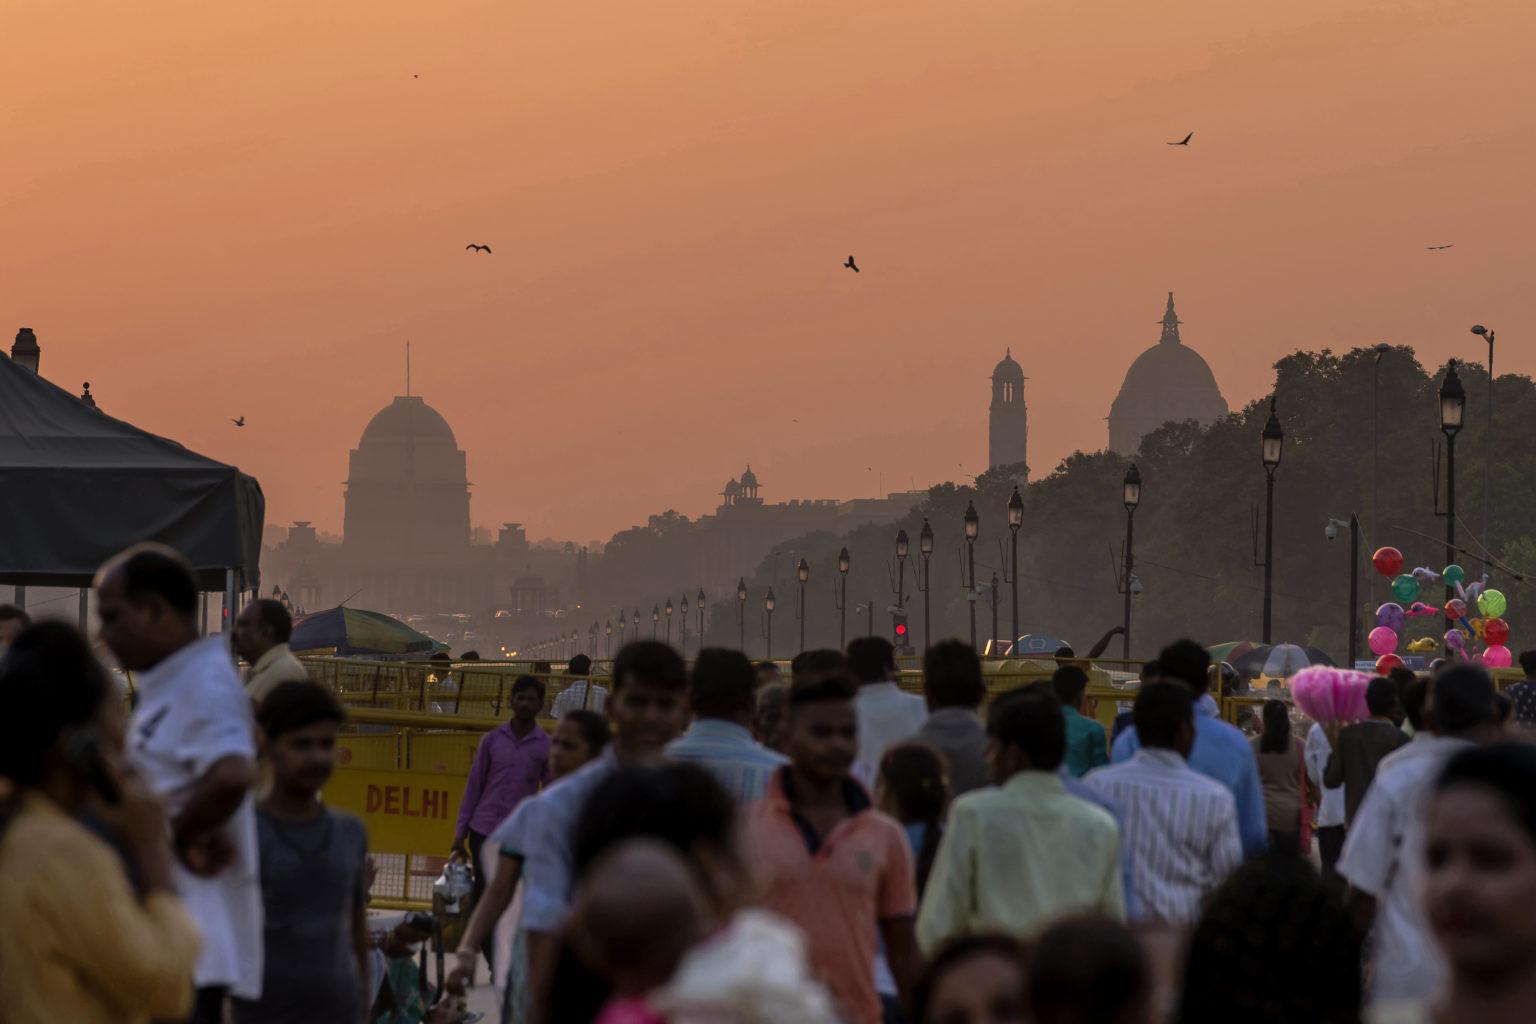 Walking tour in Delhi